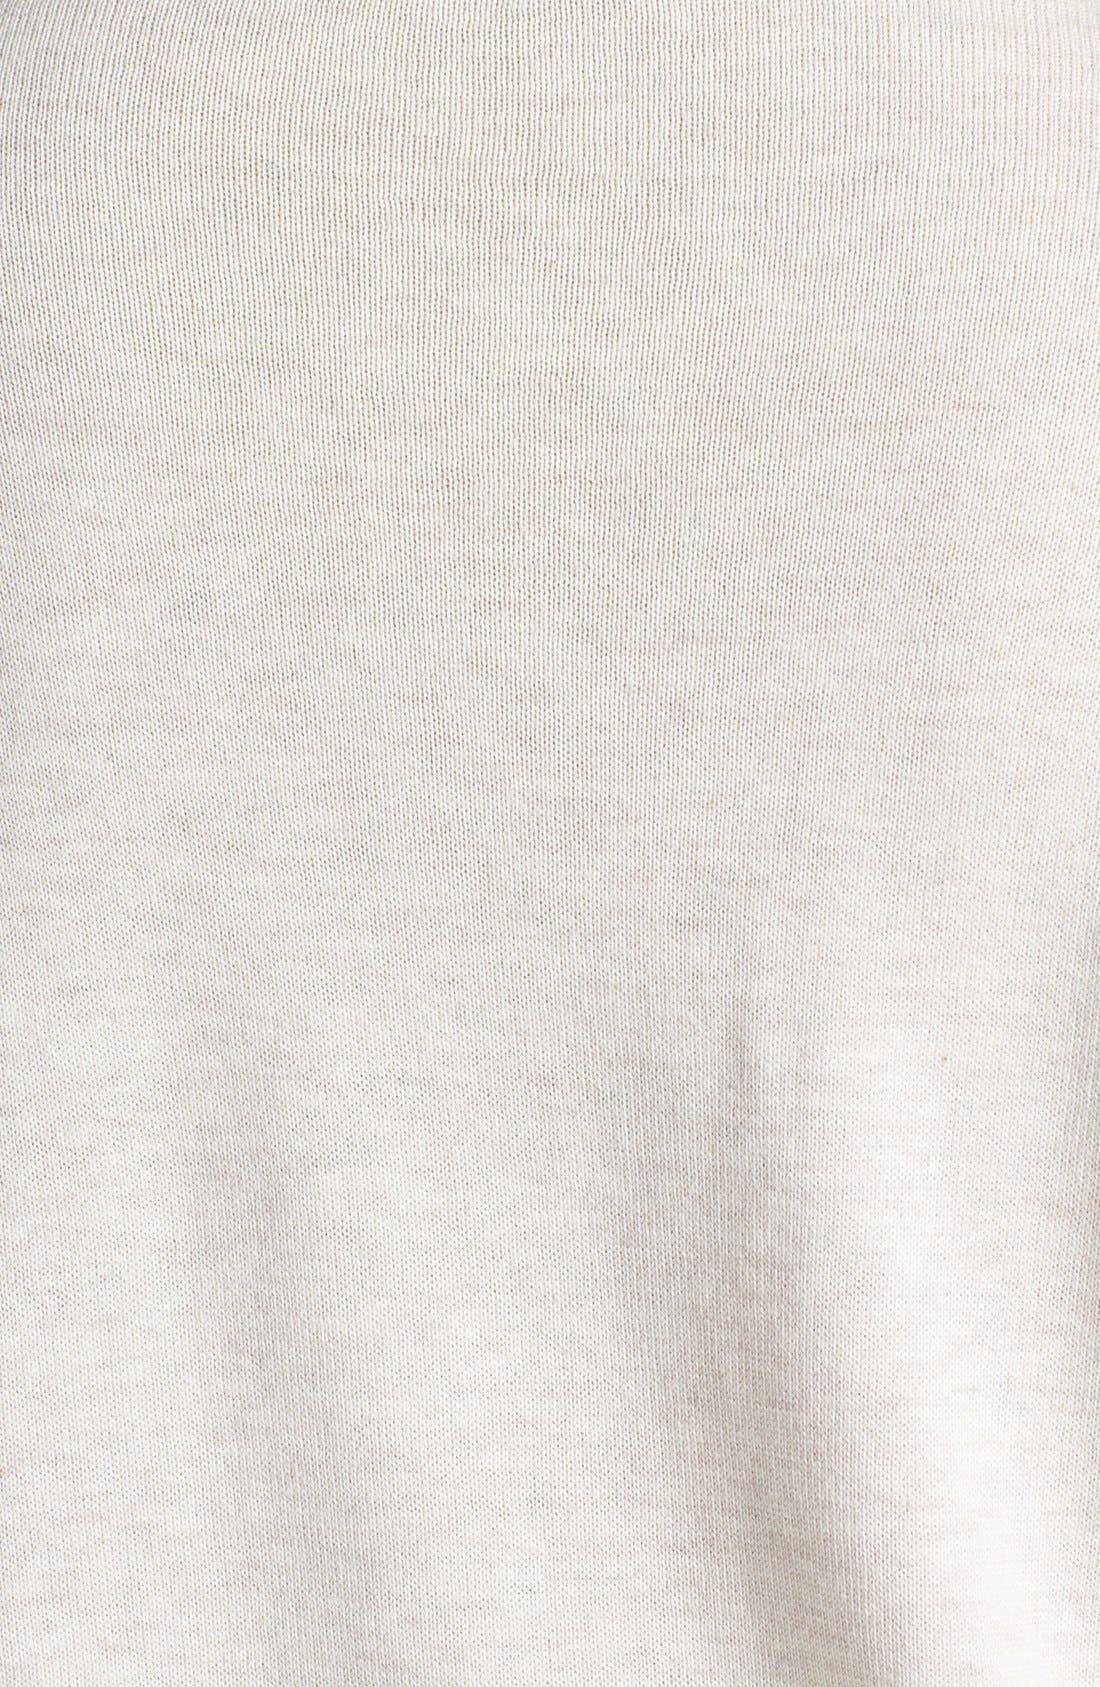 Intarsia Crewneck Sweater,                             Alternate thumbnail 16, color,